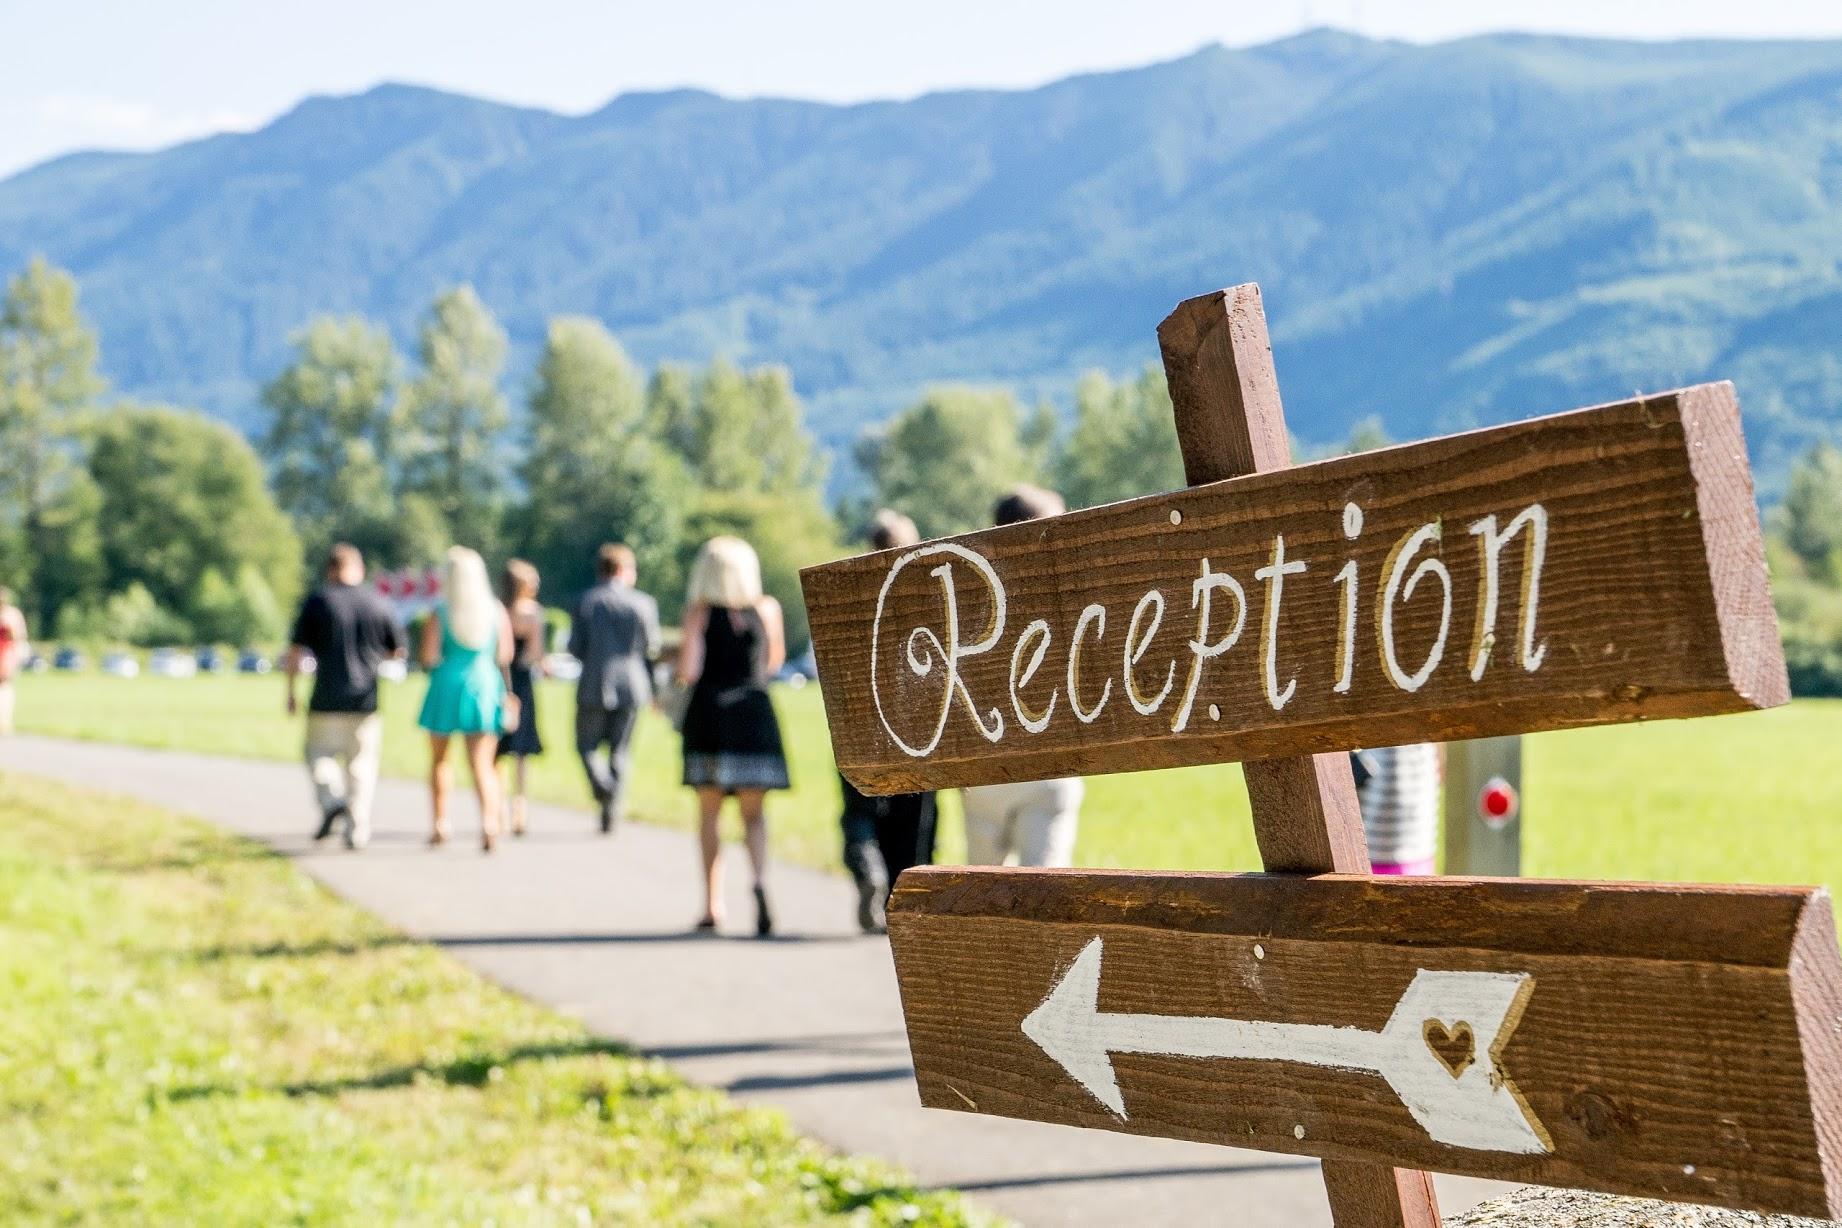 PNW Wedding wooden reception sign| Meadowbrook Farm Wedding, Snoqualmie, WA | Perfectly Posh Events, Seattle Wedding Planner | Sasha Reiko Photography | Jesse + Wes Wedding // © Sasha Reiko Photography